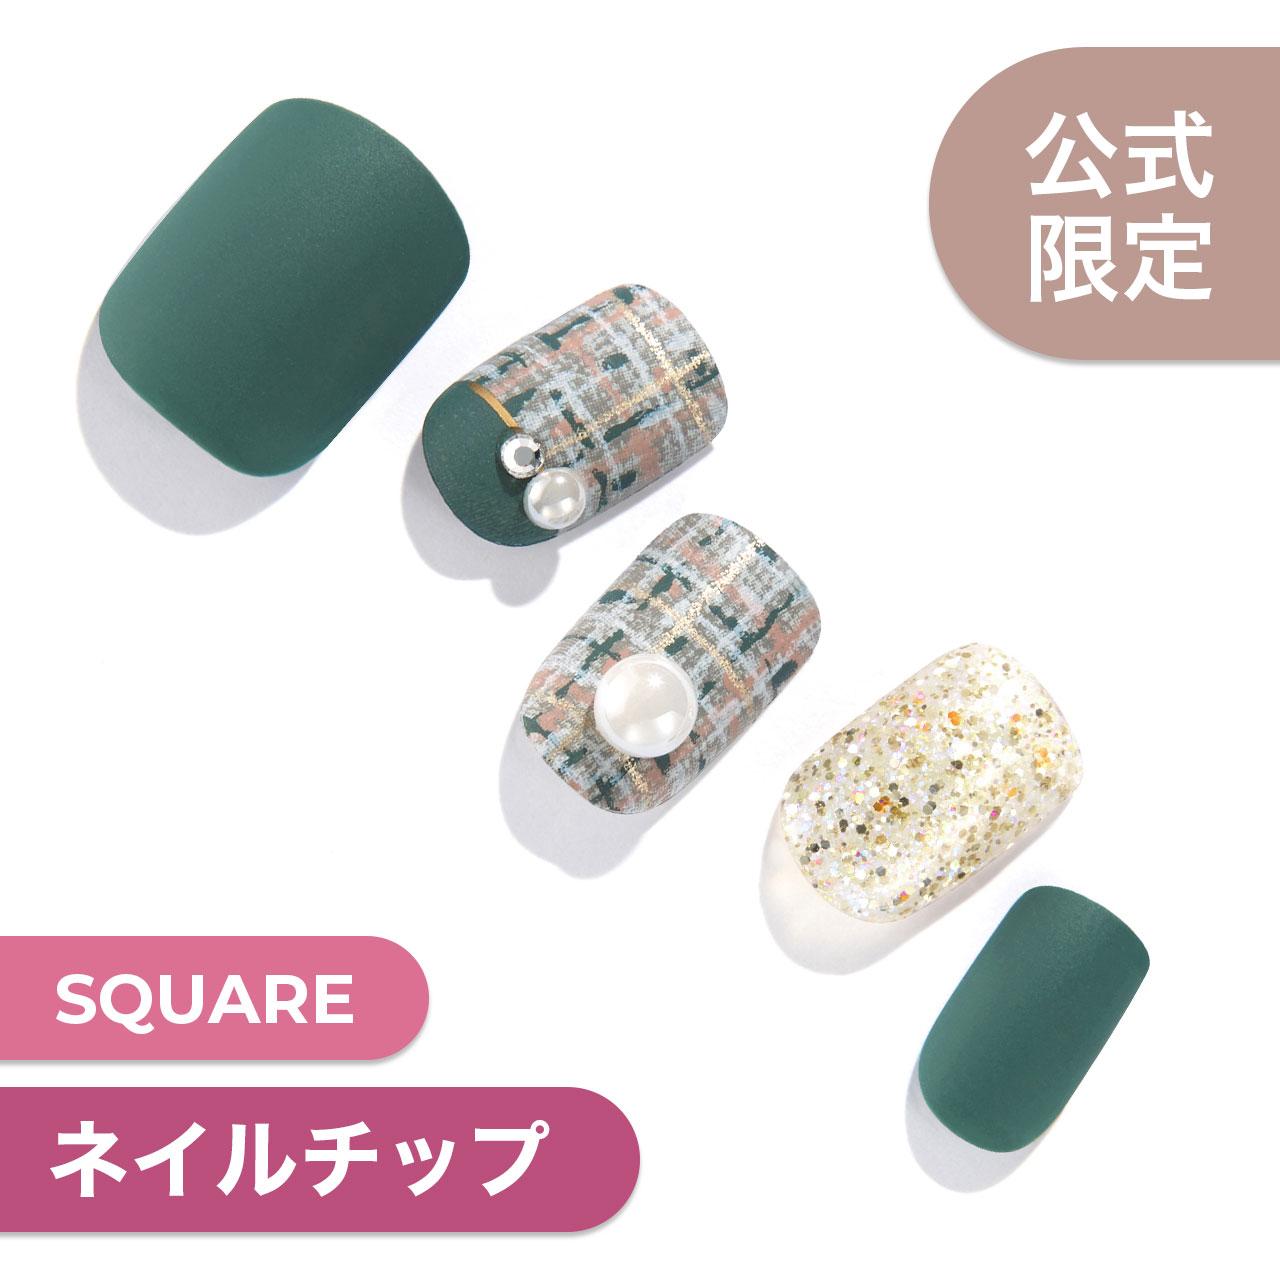 【Teal Green Tweed】ダッシングディバマジックプレス